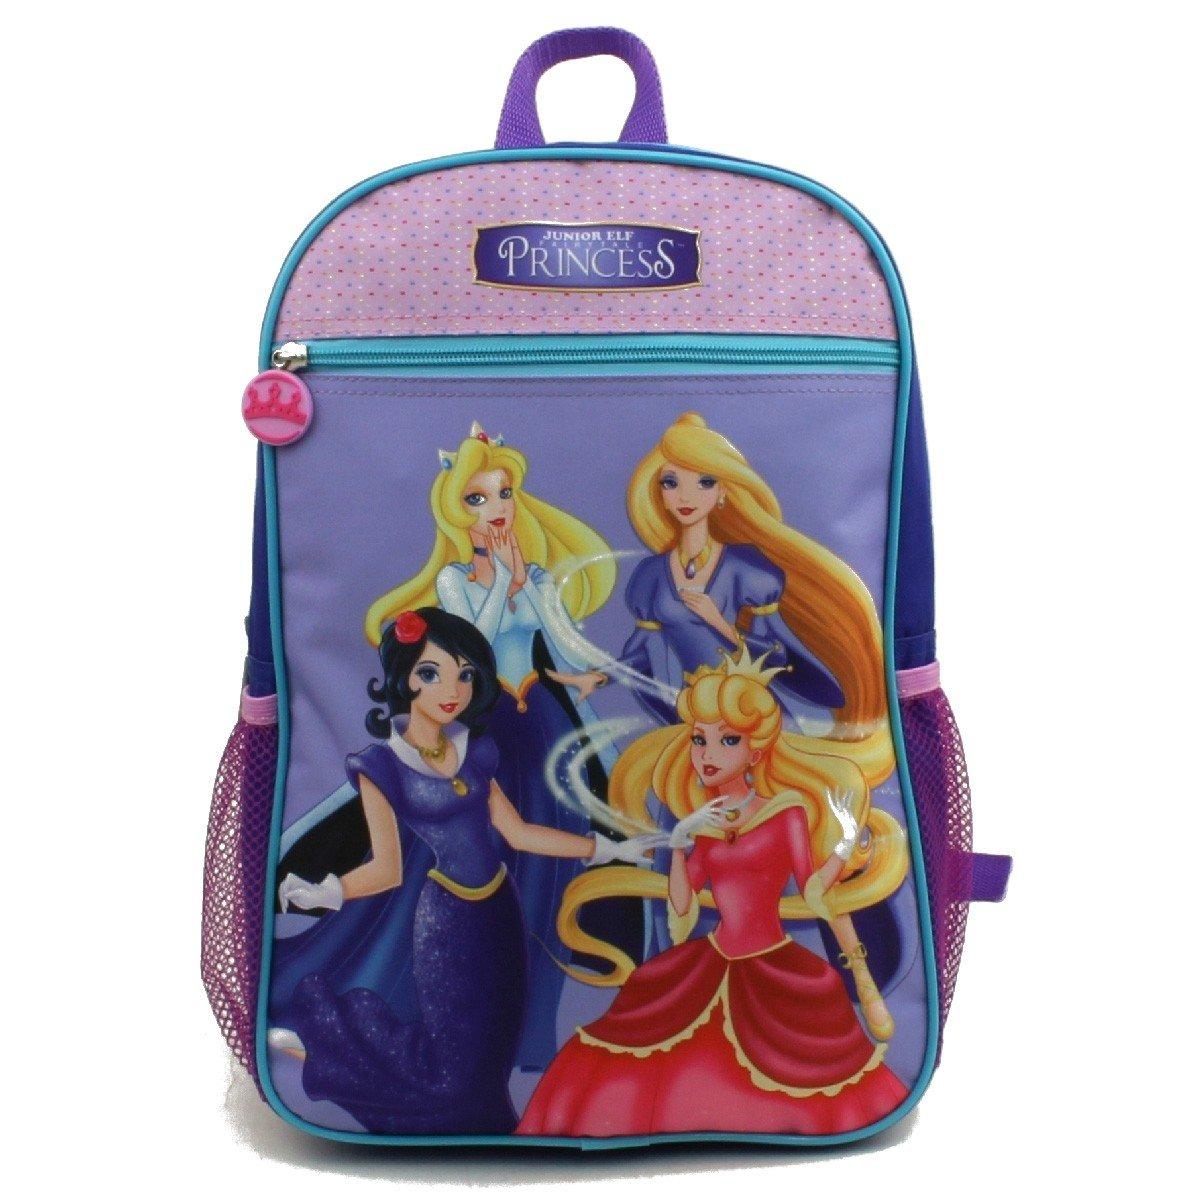 15'' Wholesale Junior Elf Princess Backpack - Case of 24